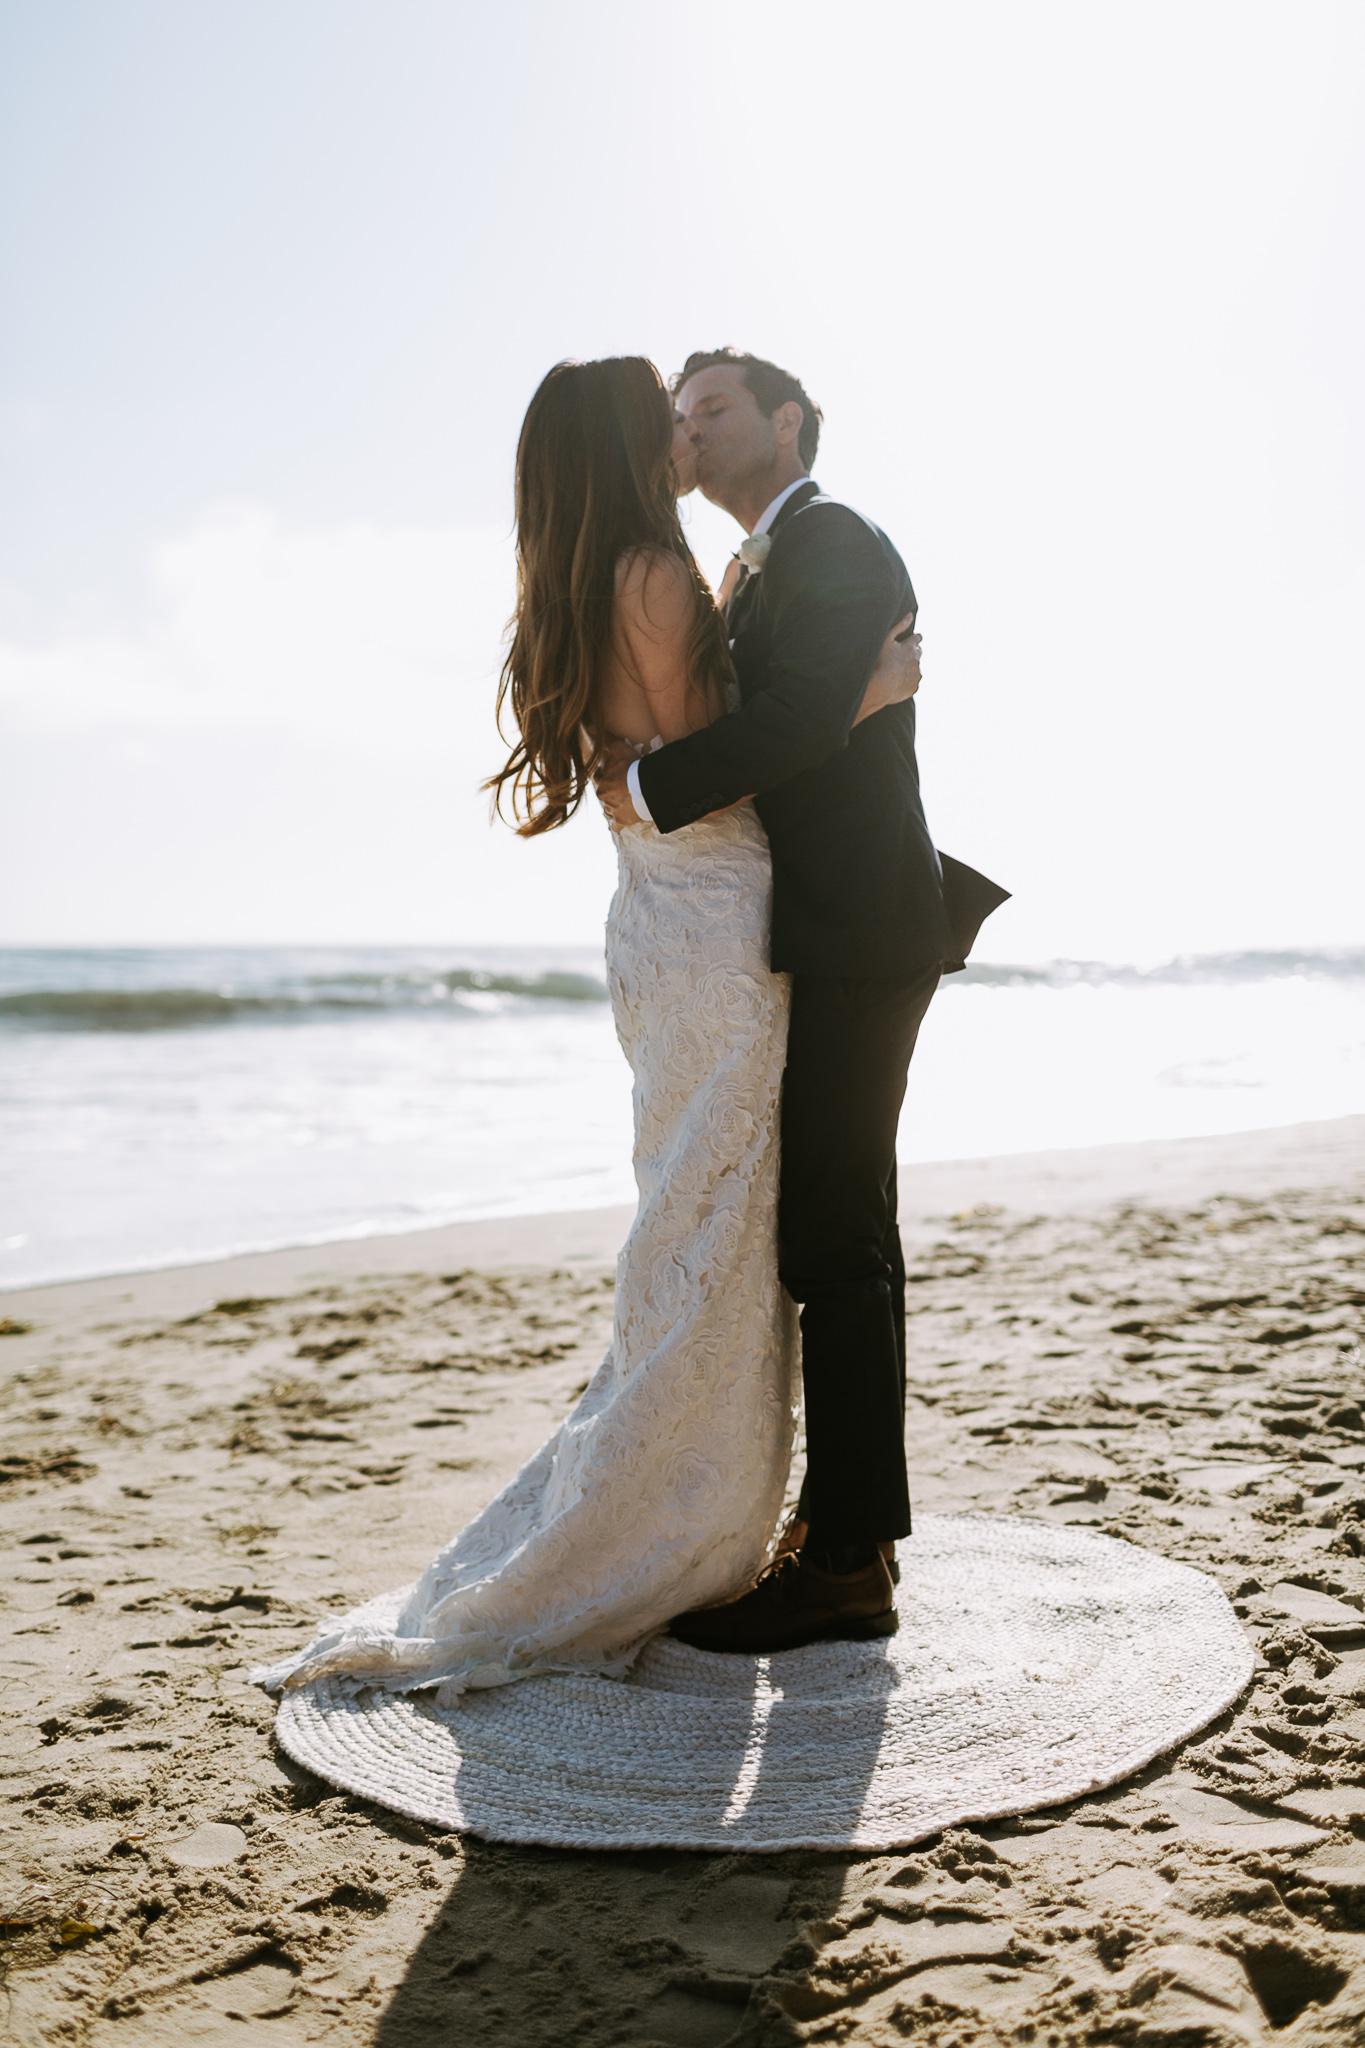 LagunaBeach-WeddingPhotographer-39.jpg